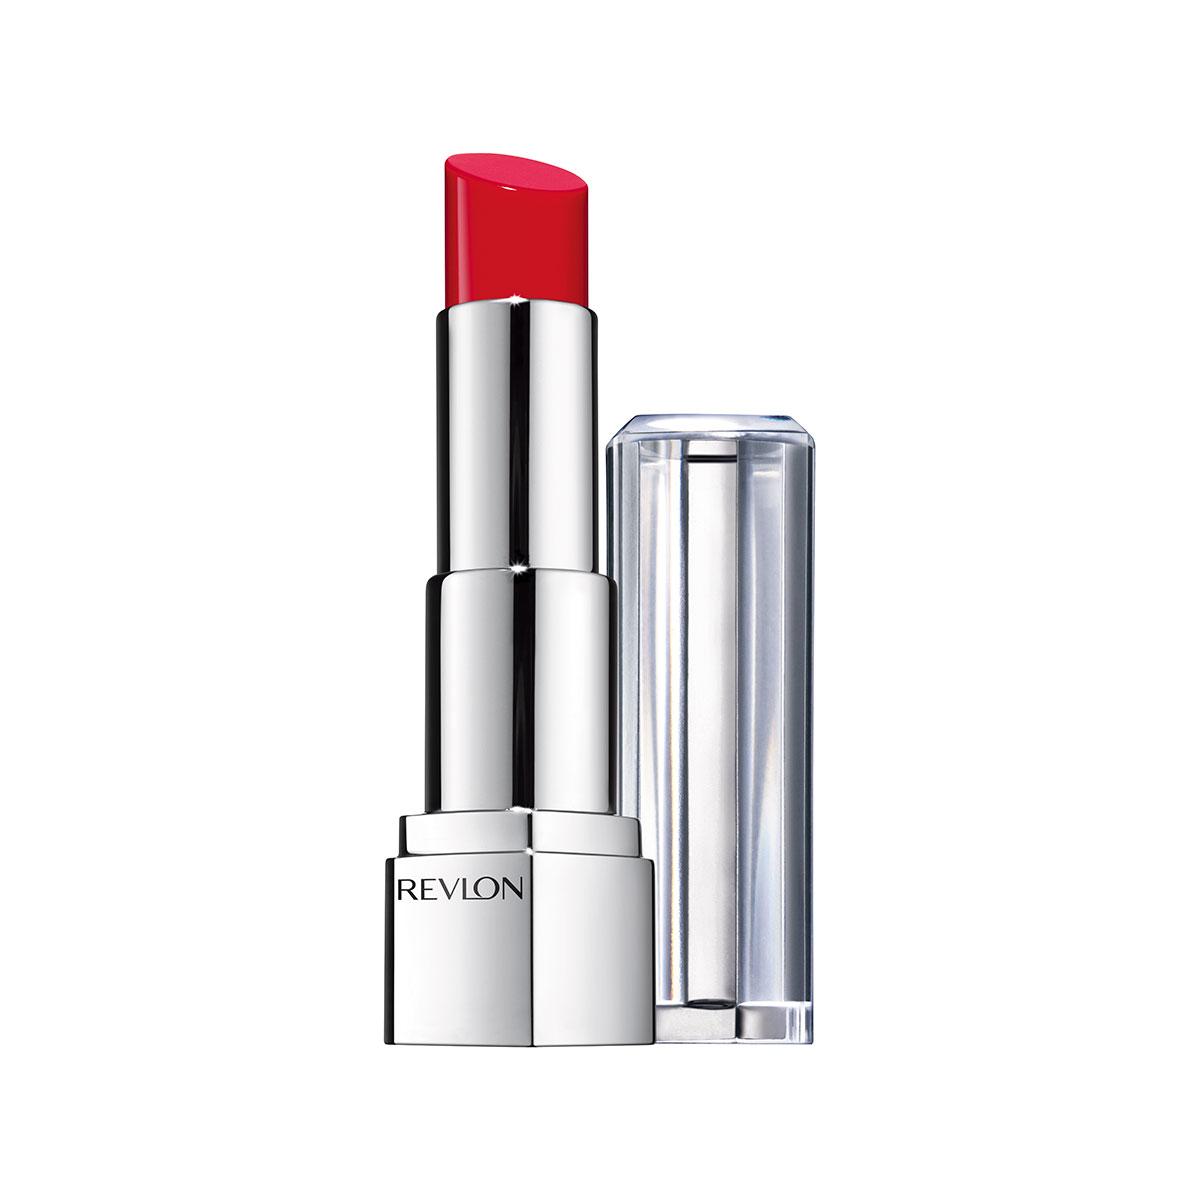 Revlon Помада для Губ Ultra Hd Lipstick Gladiolas 875 25 г 7210493065